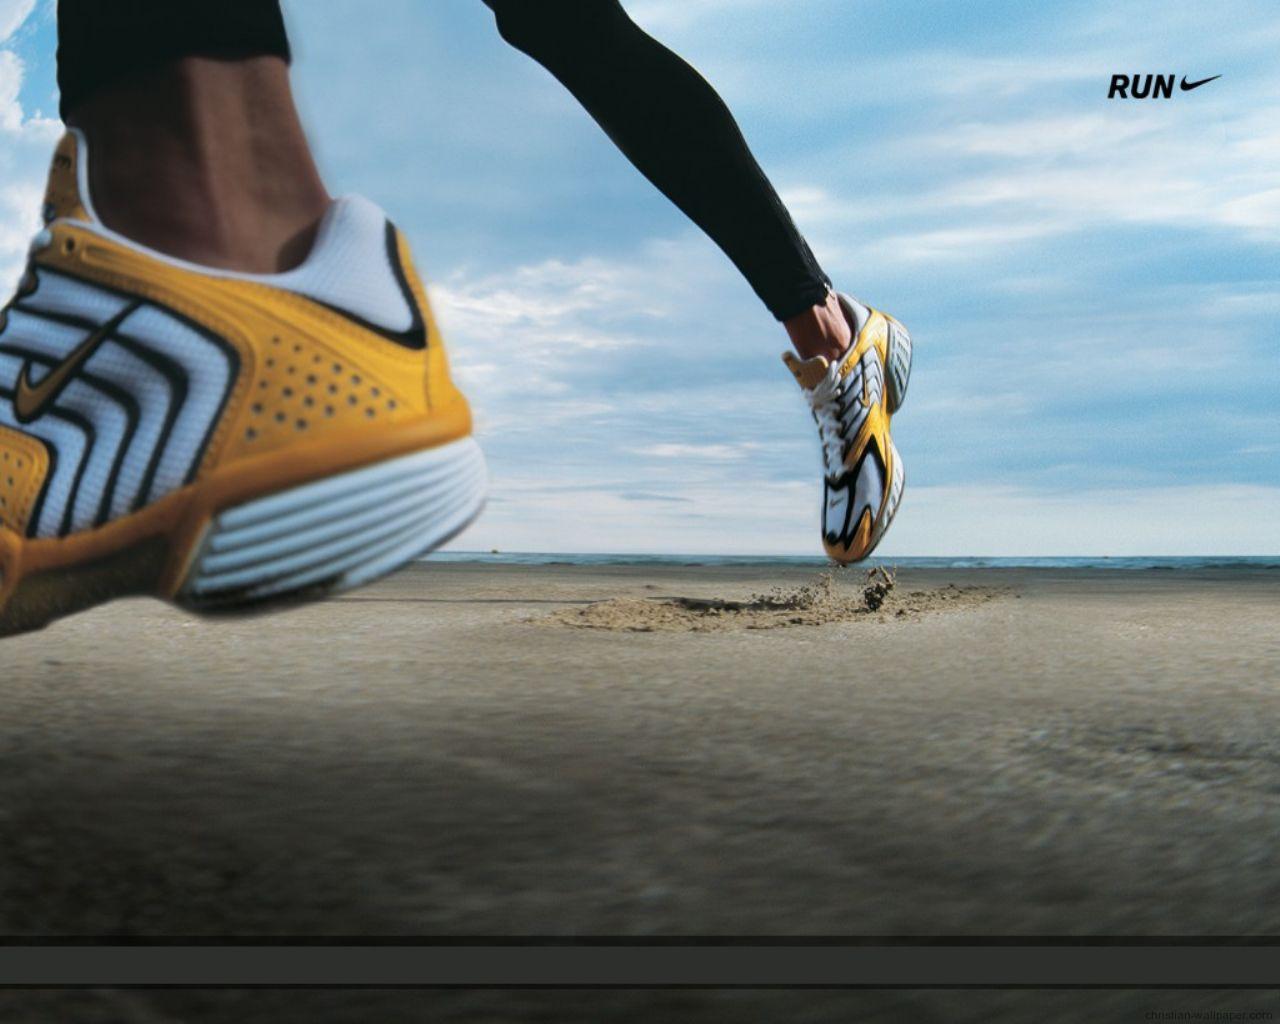 Free Download Nike Run Wallpapers July Japan Triathlon